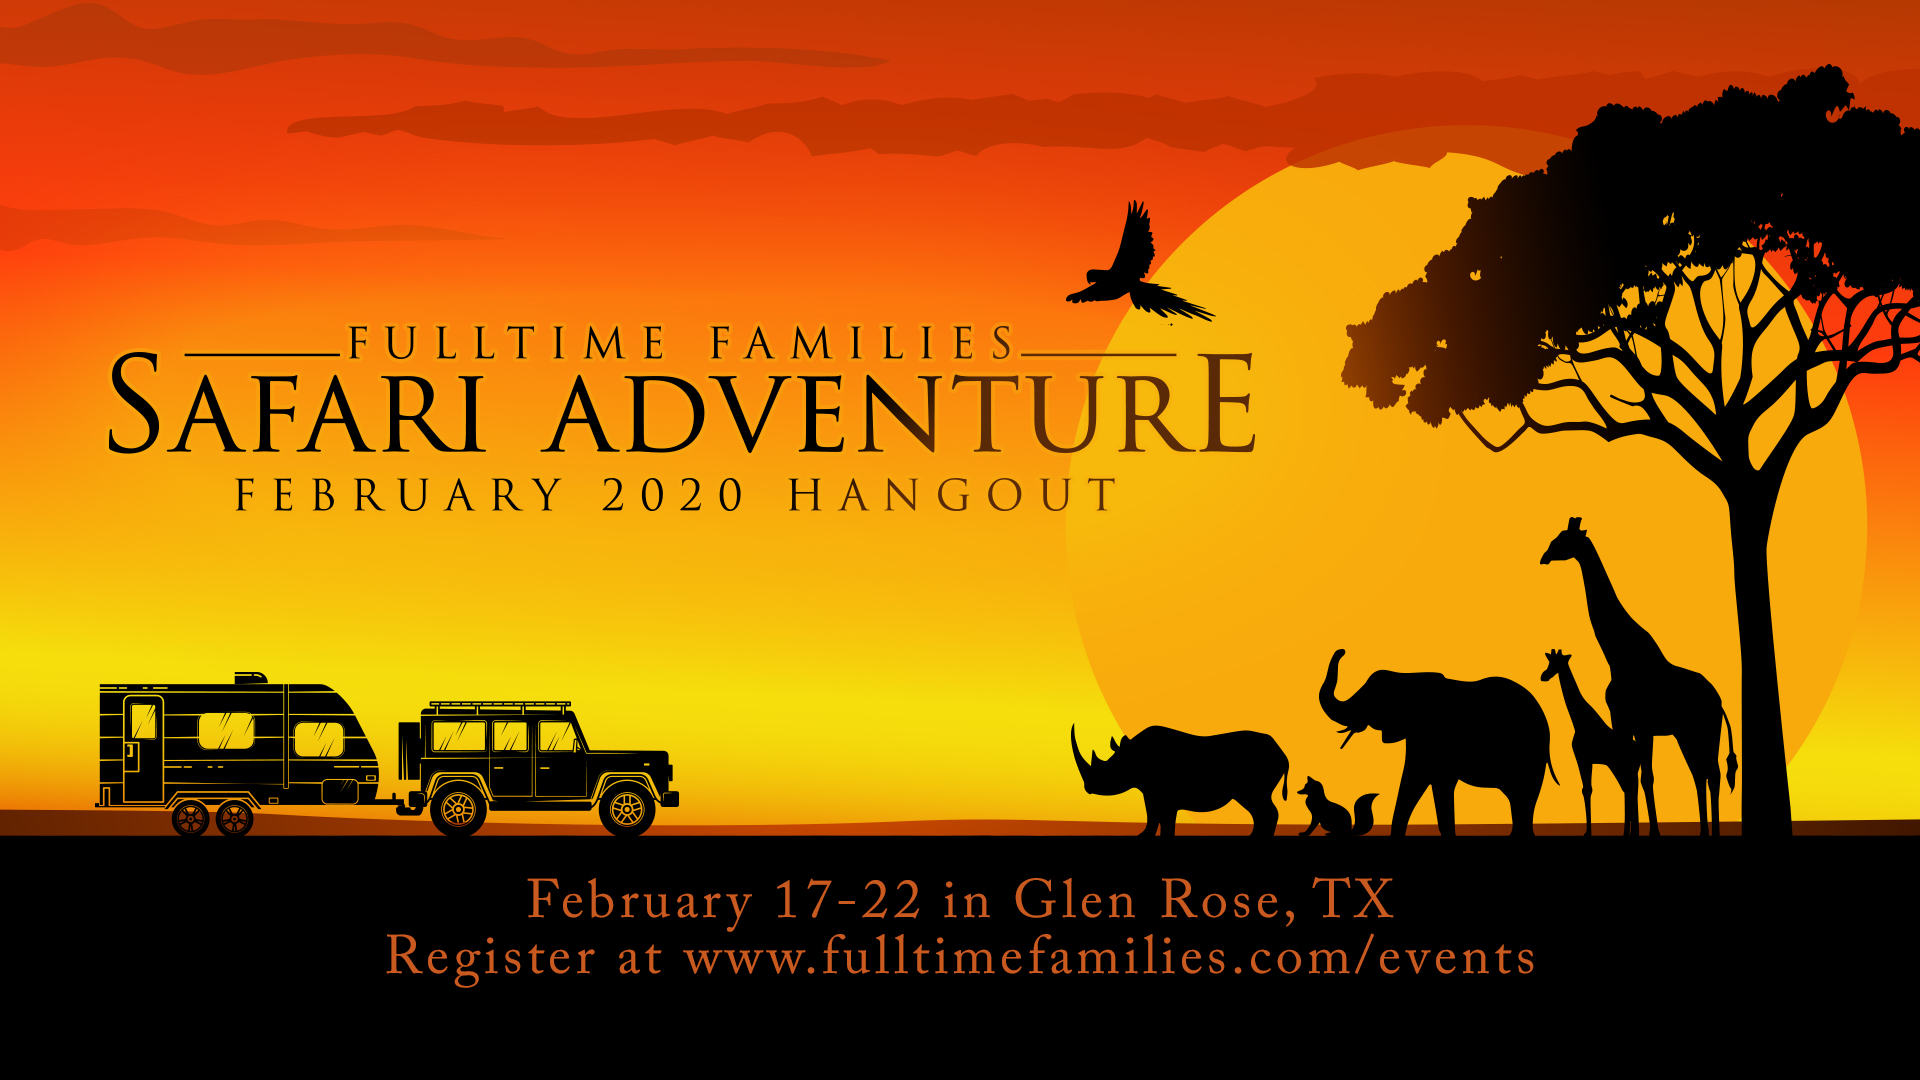 2020 Safari Adventure Hangout - SOLD OUT - Fulltime Families